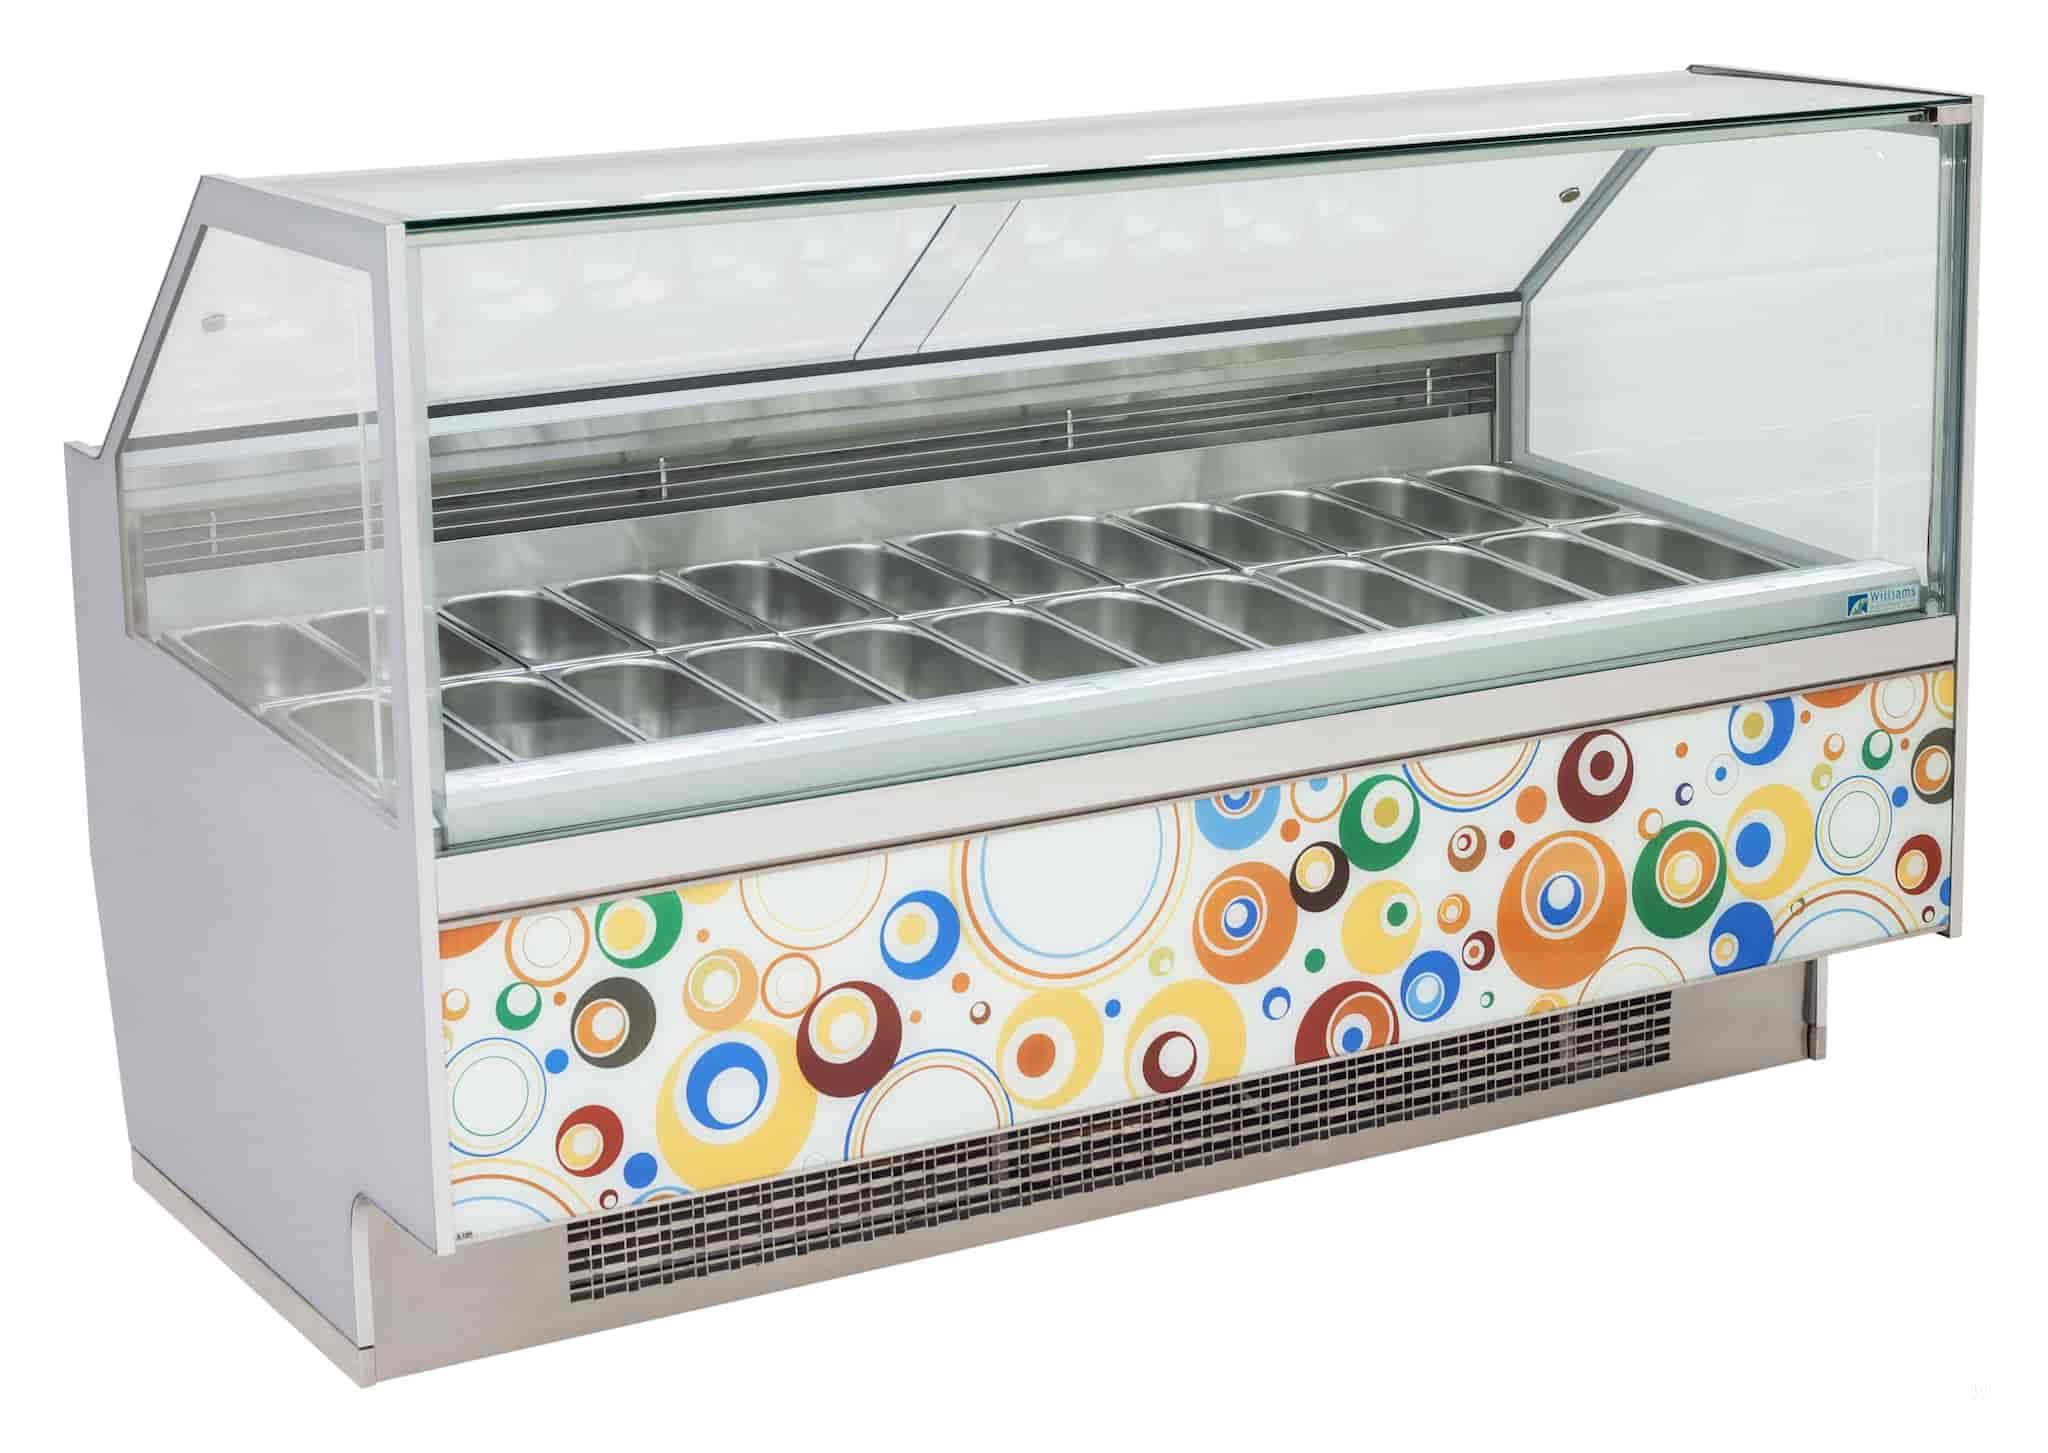 fridge french appliances counter item countertop display cuft ft lg cu refrigerator instaview depth door refrigerators products signature in